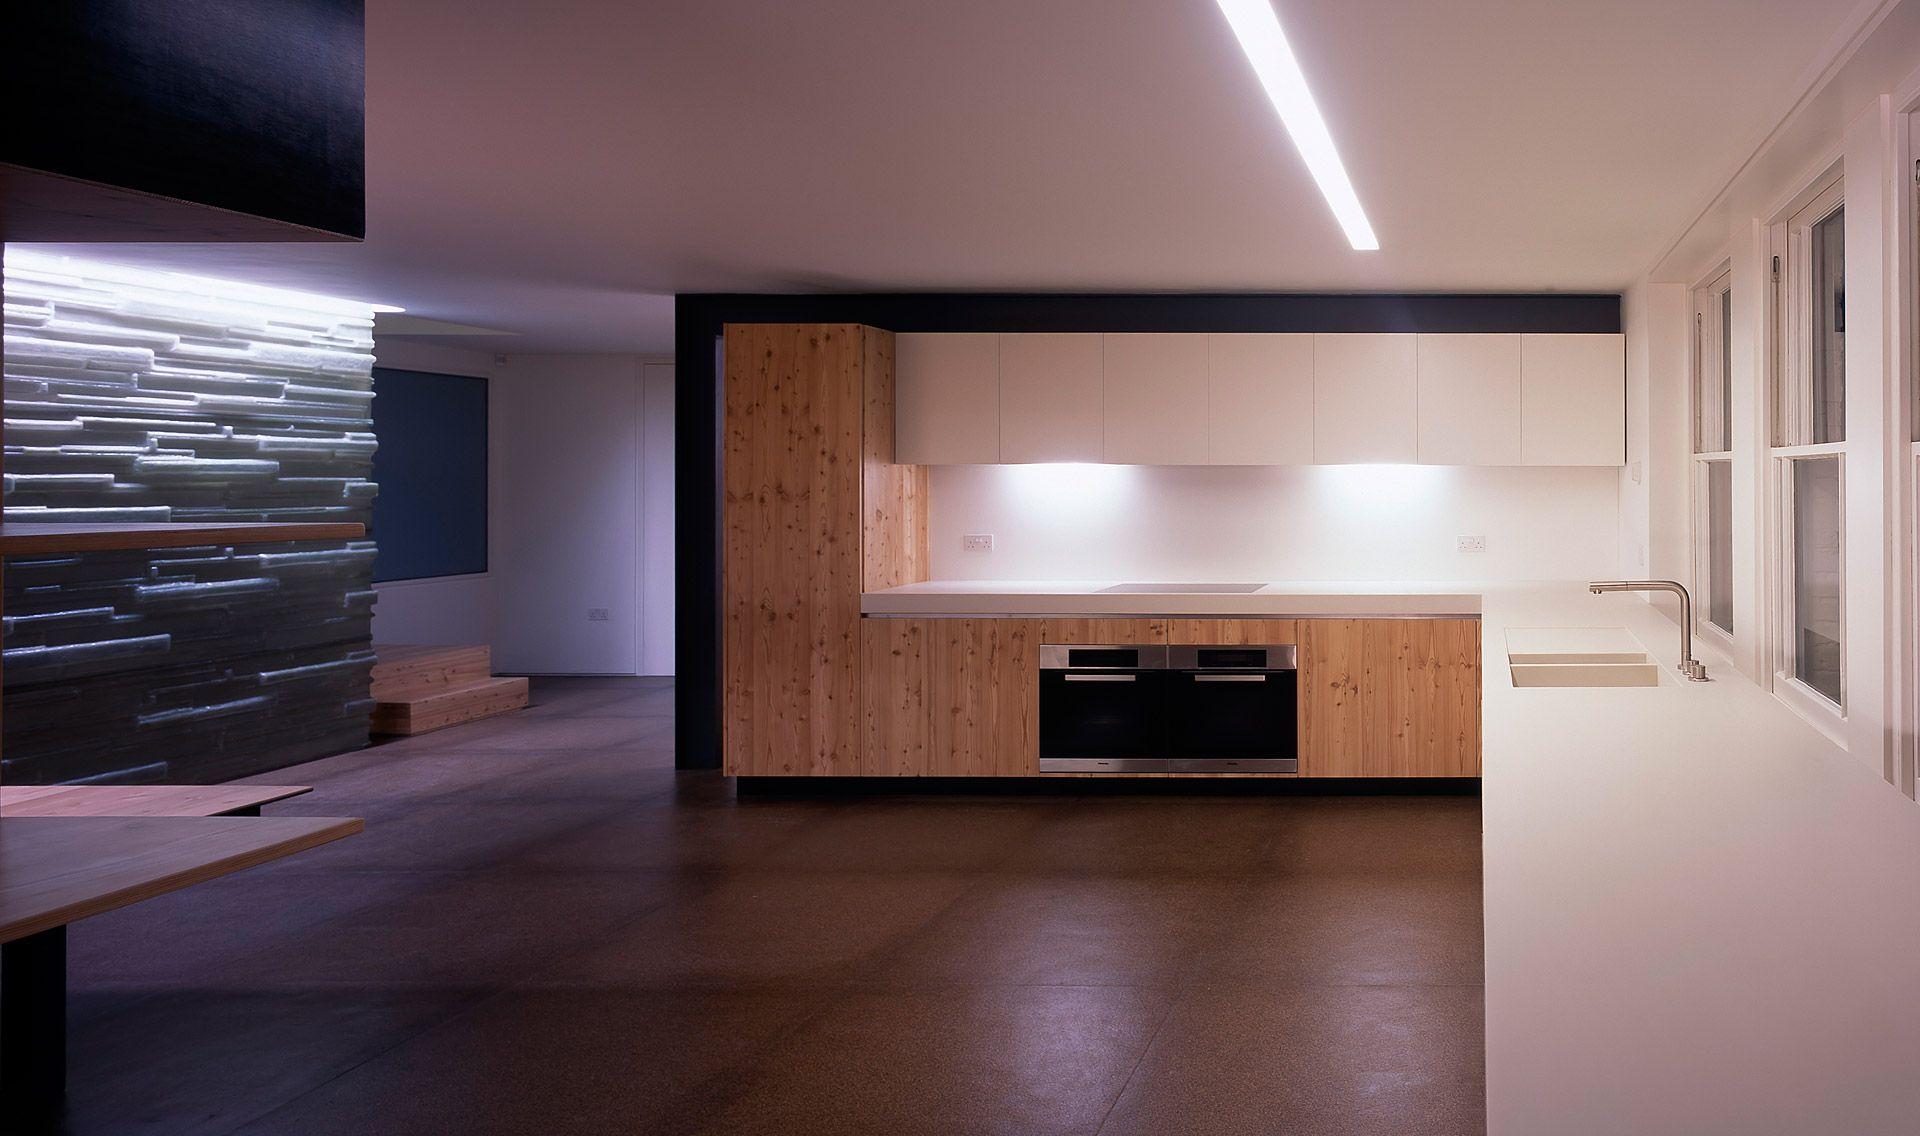 Kitchens perren street tintab contemporary bespoke for Modern kitchen manufacturers